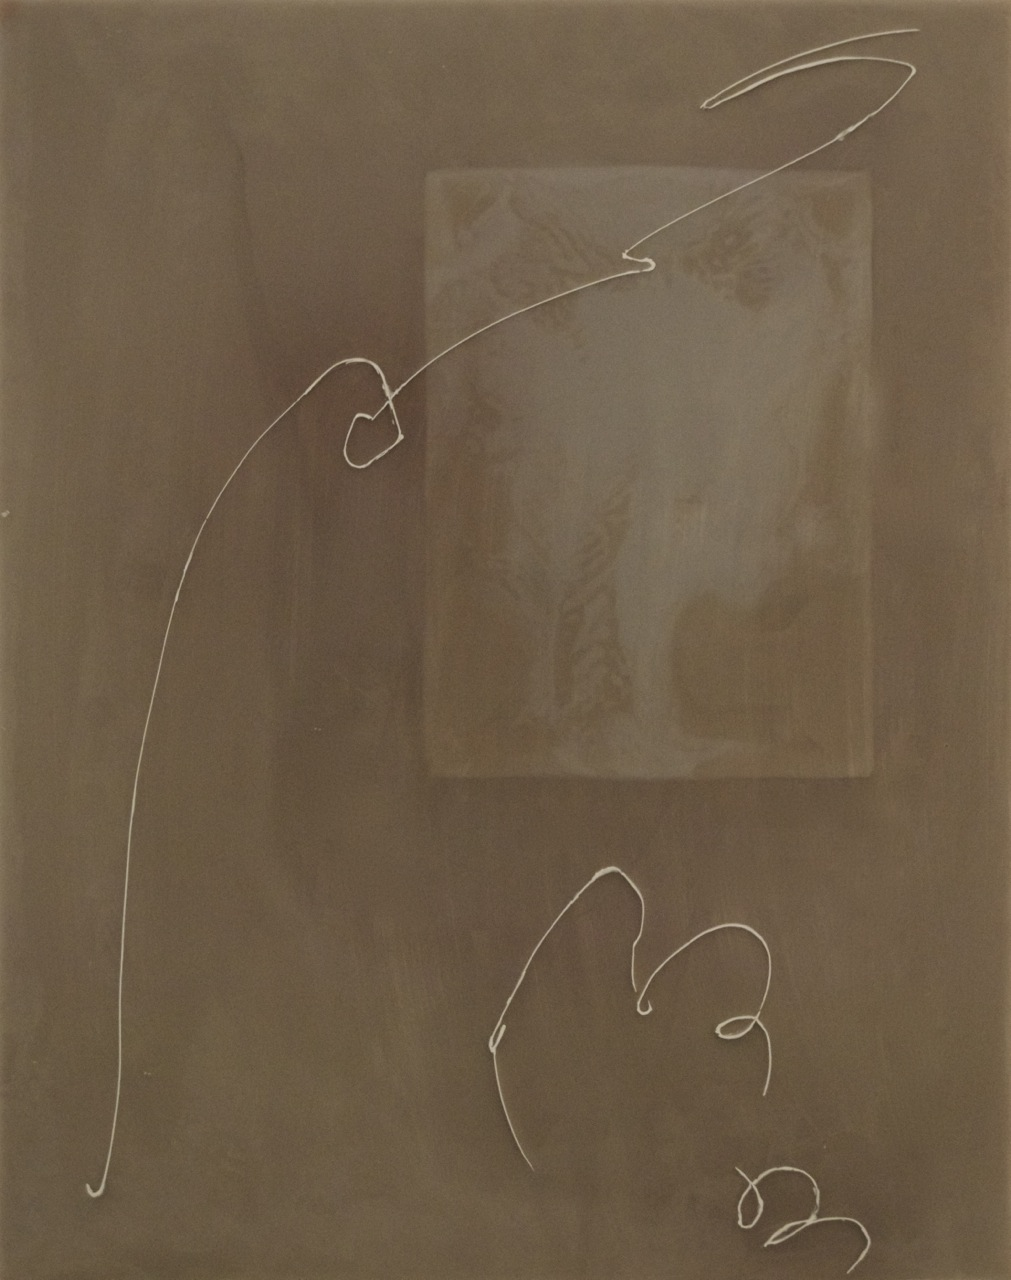 Peter Flaccus, Gray Scribble, 2011, encausto su tavola, cm 43x34